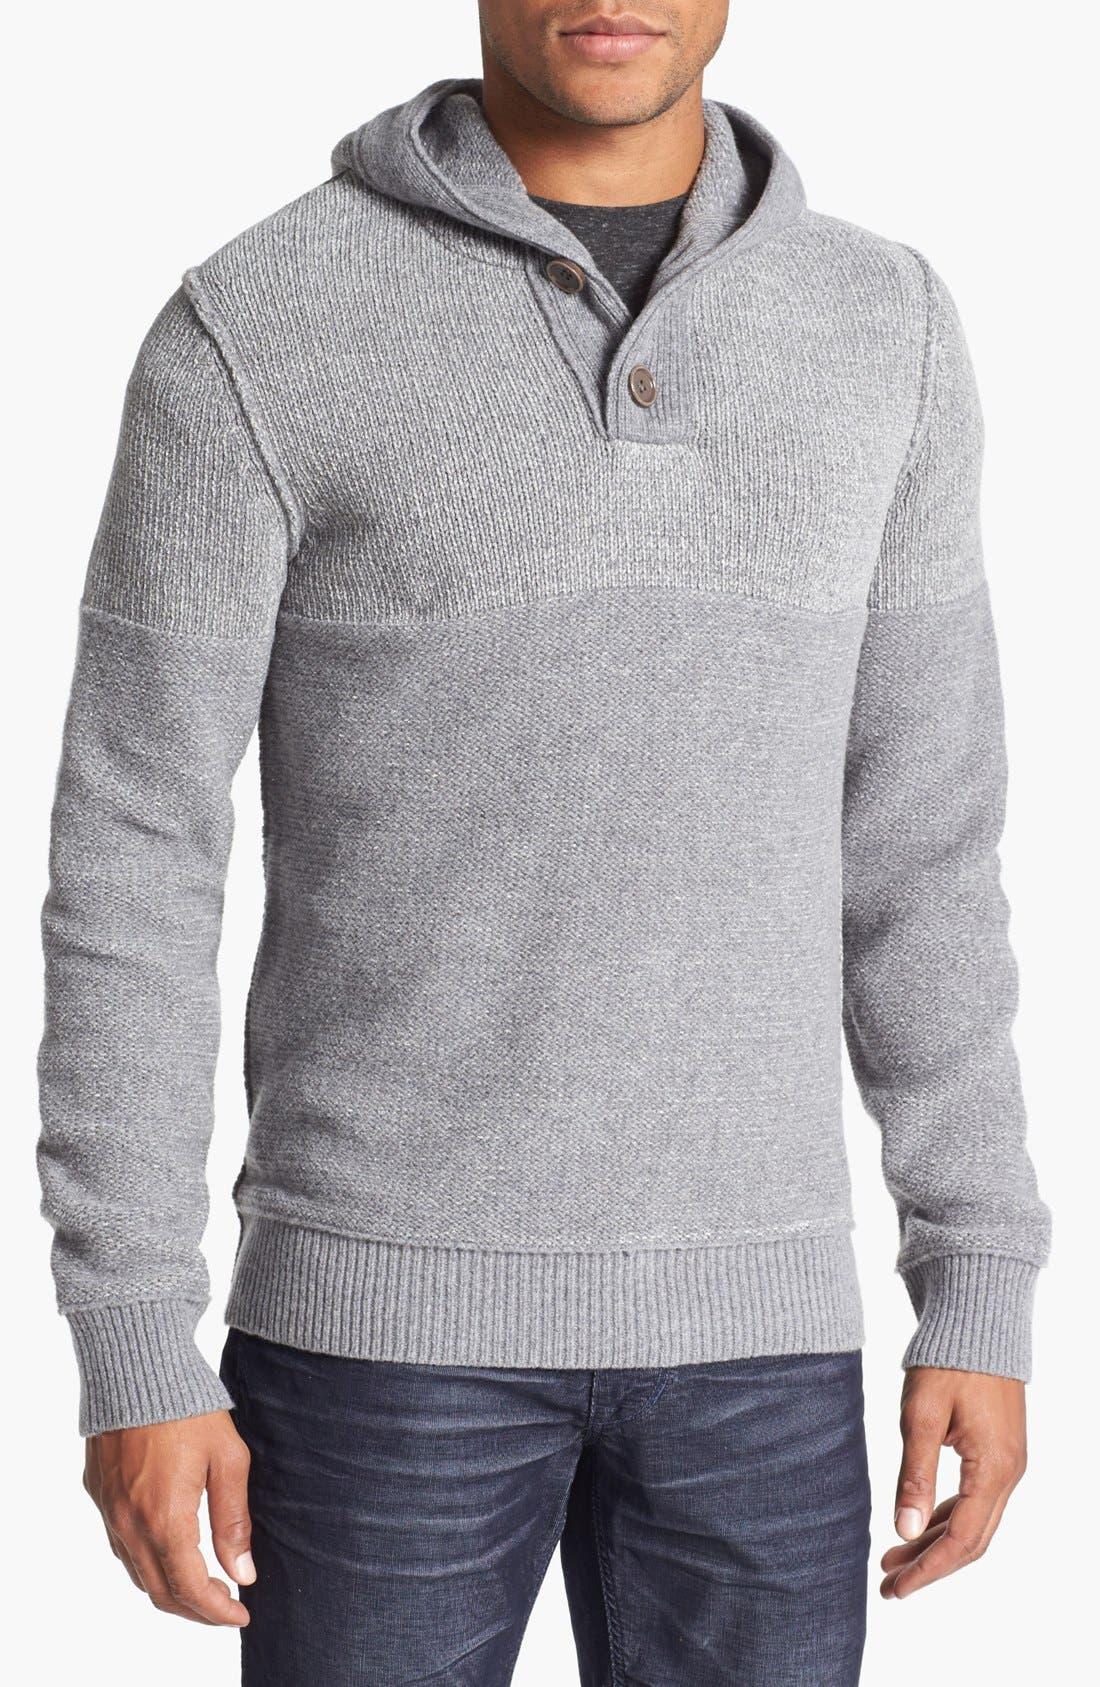 'Karsone' Hooded Sweater,                             Main thumbnail 1, color,                             051